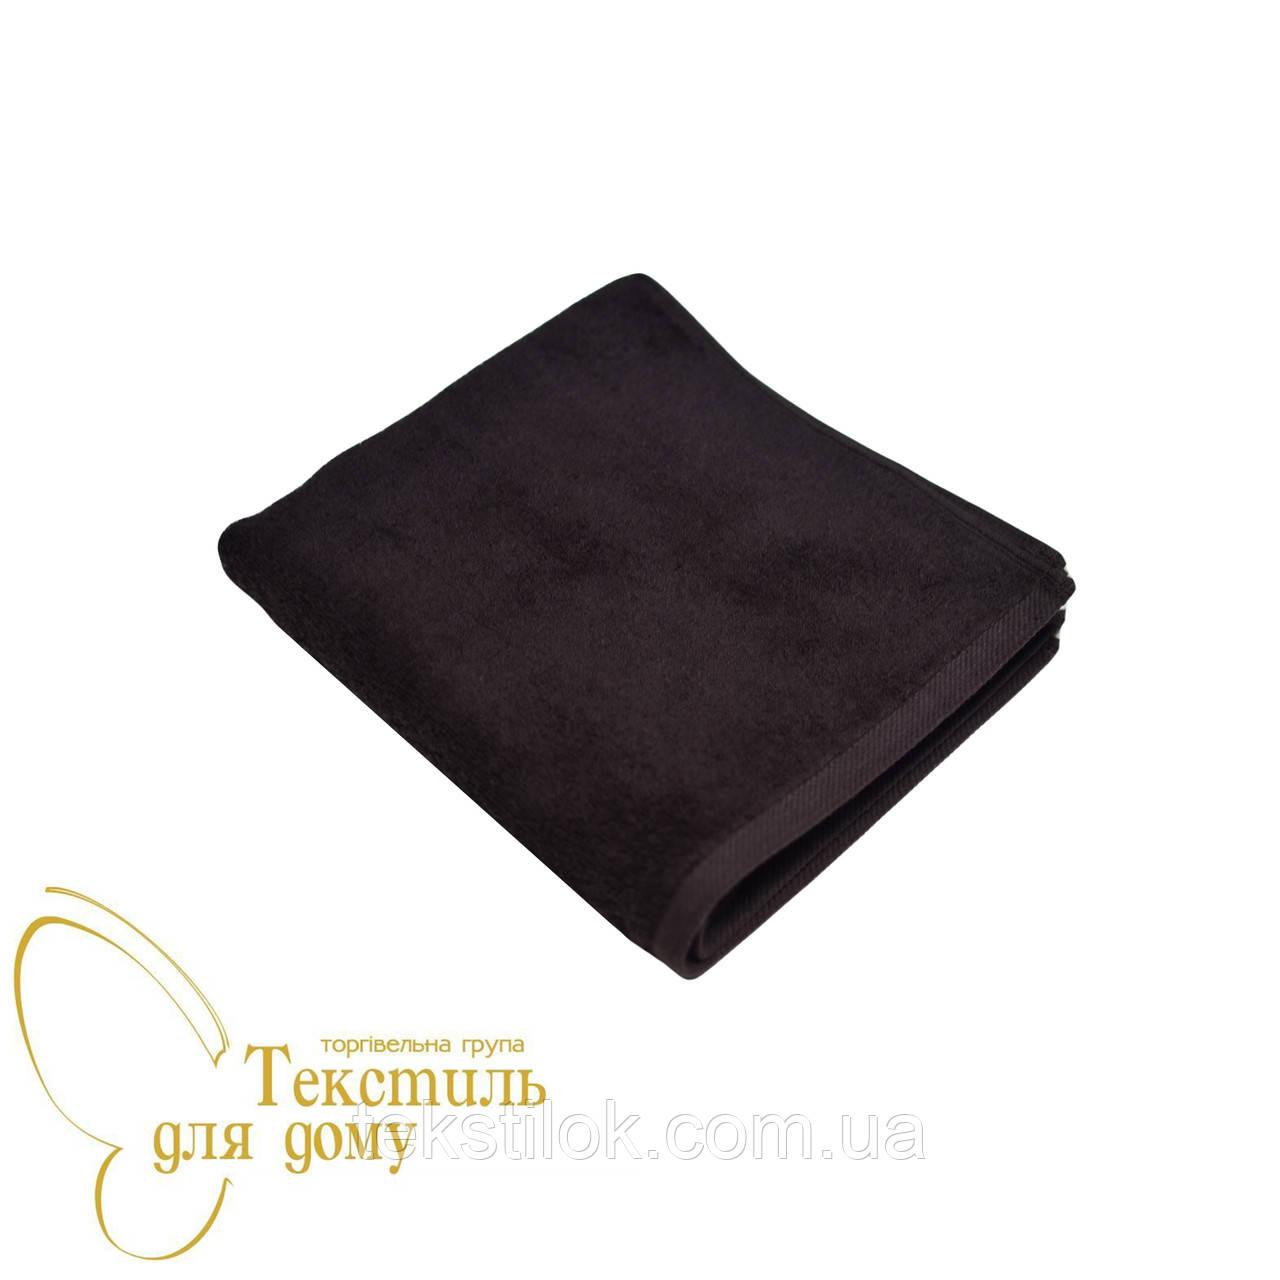 Полотенце лицевое 50*100, 450 гр/м2, 16/1, горький шоколад